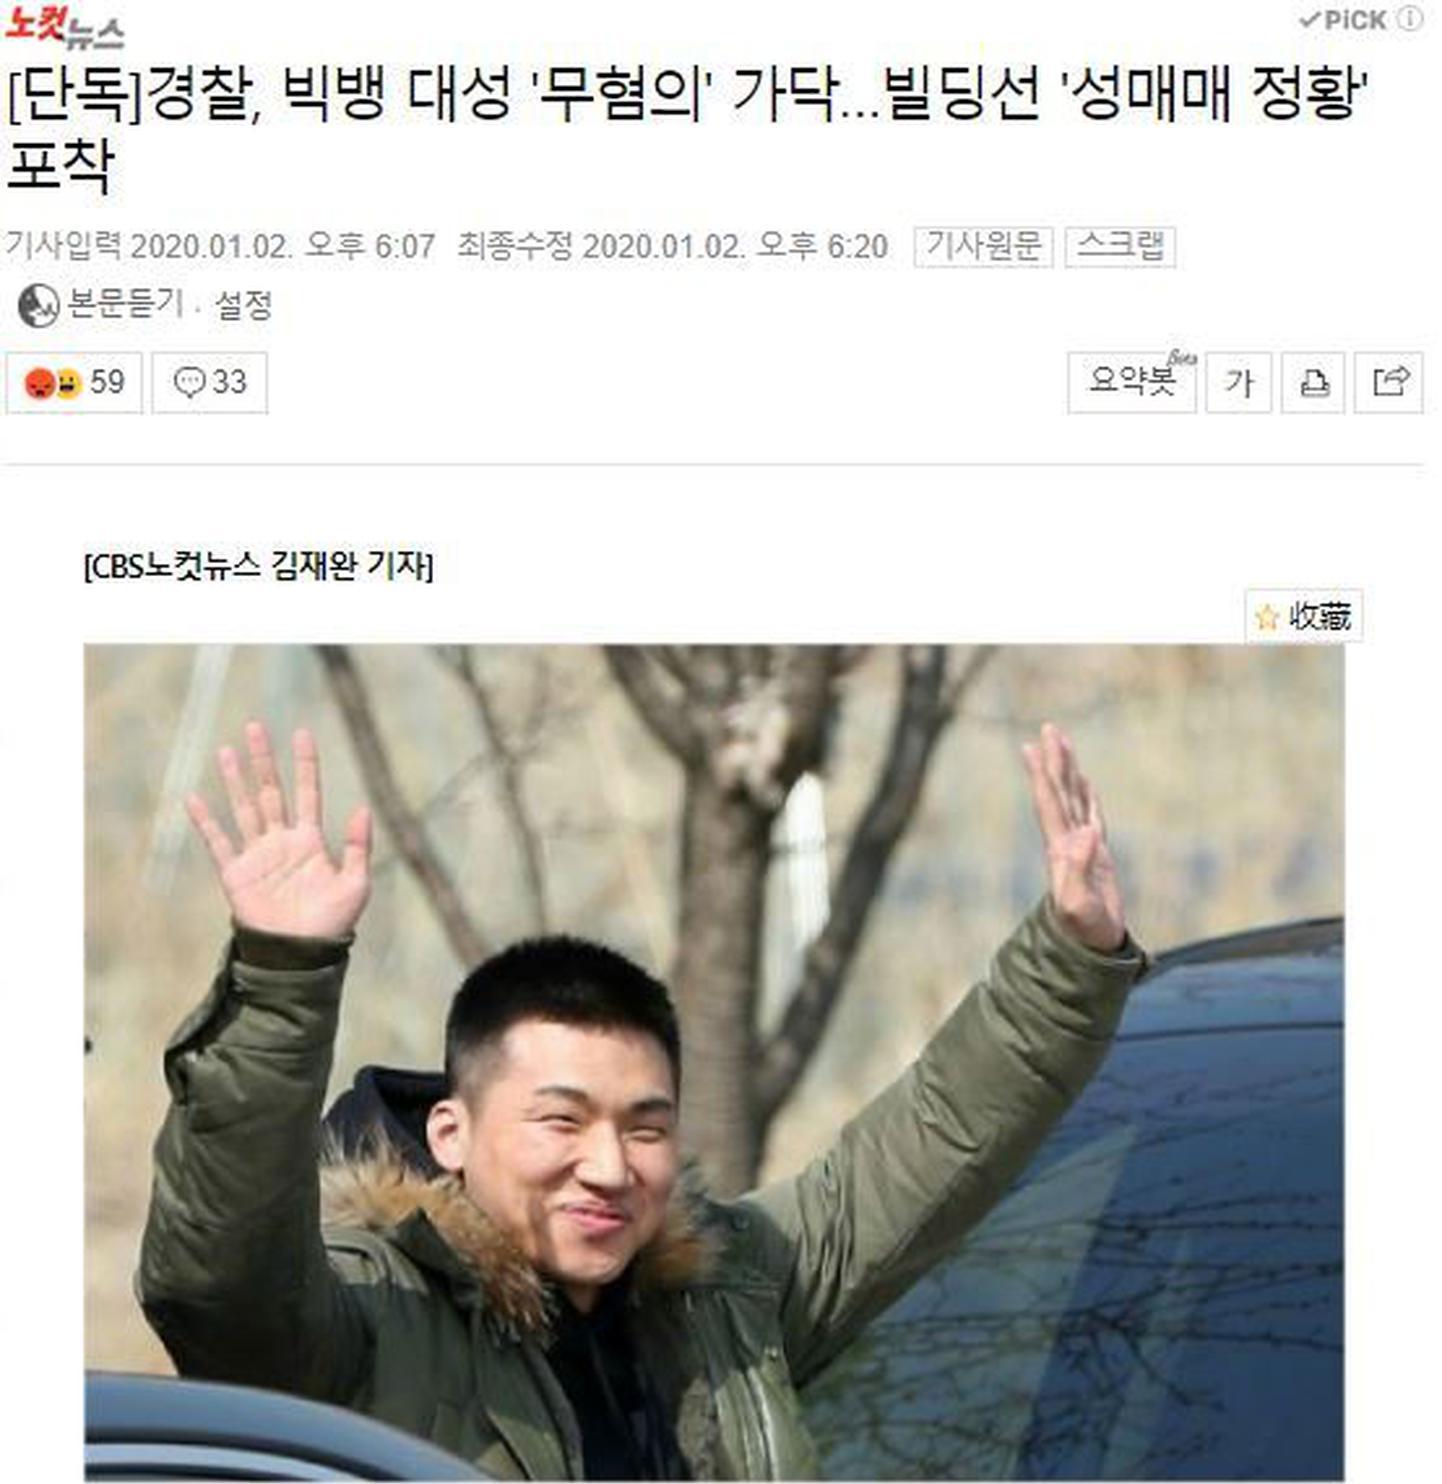 BIGBANG大声性交易相关嫌疑不成立